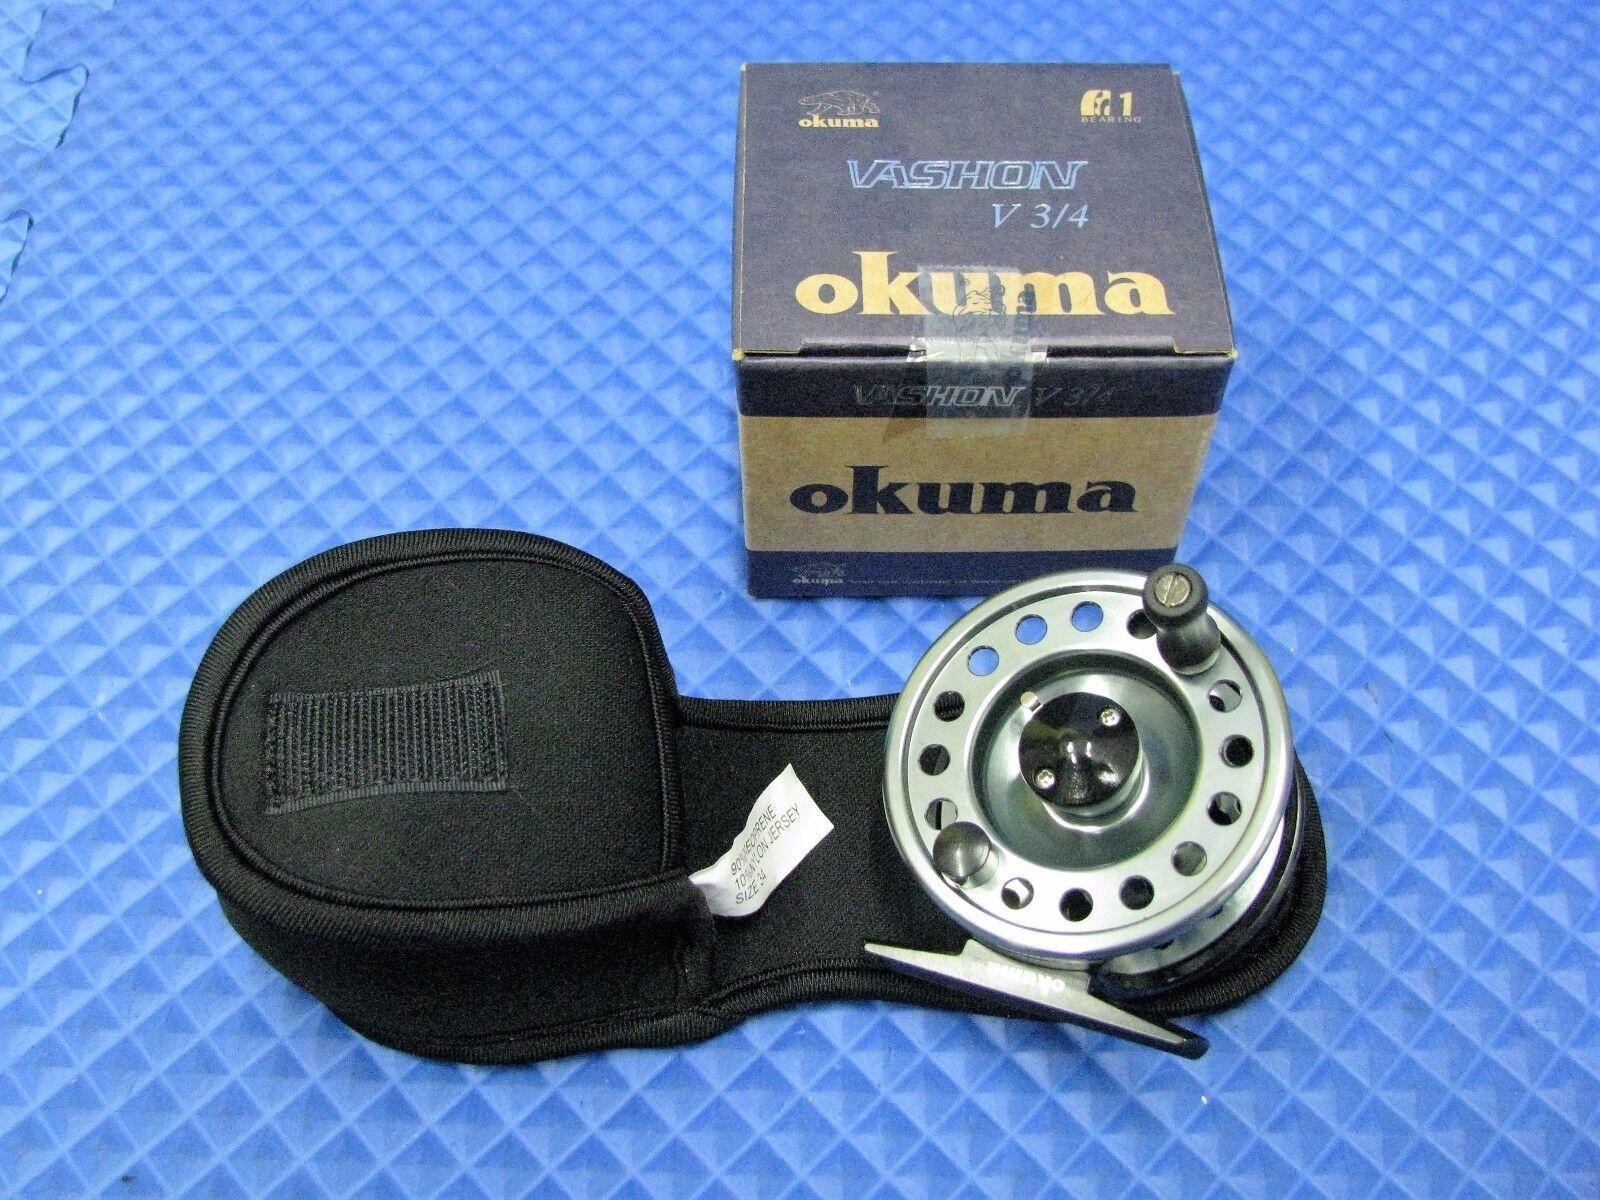 OKUMA Vashon V 3 4 FLY REEL In Box